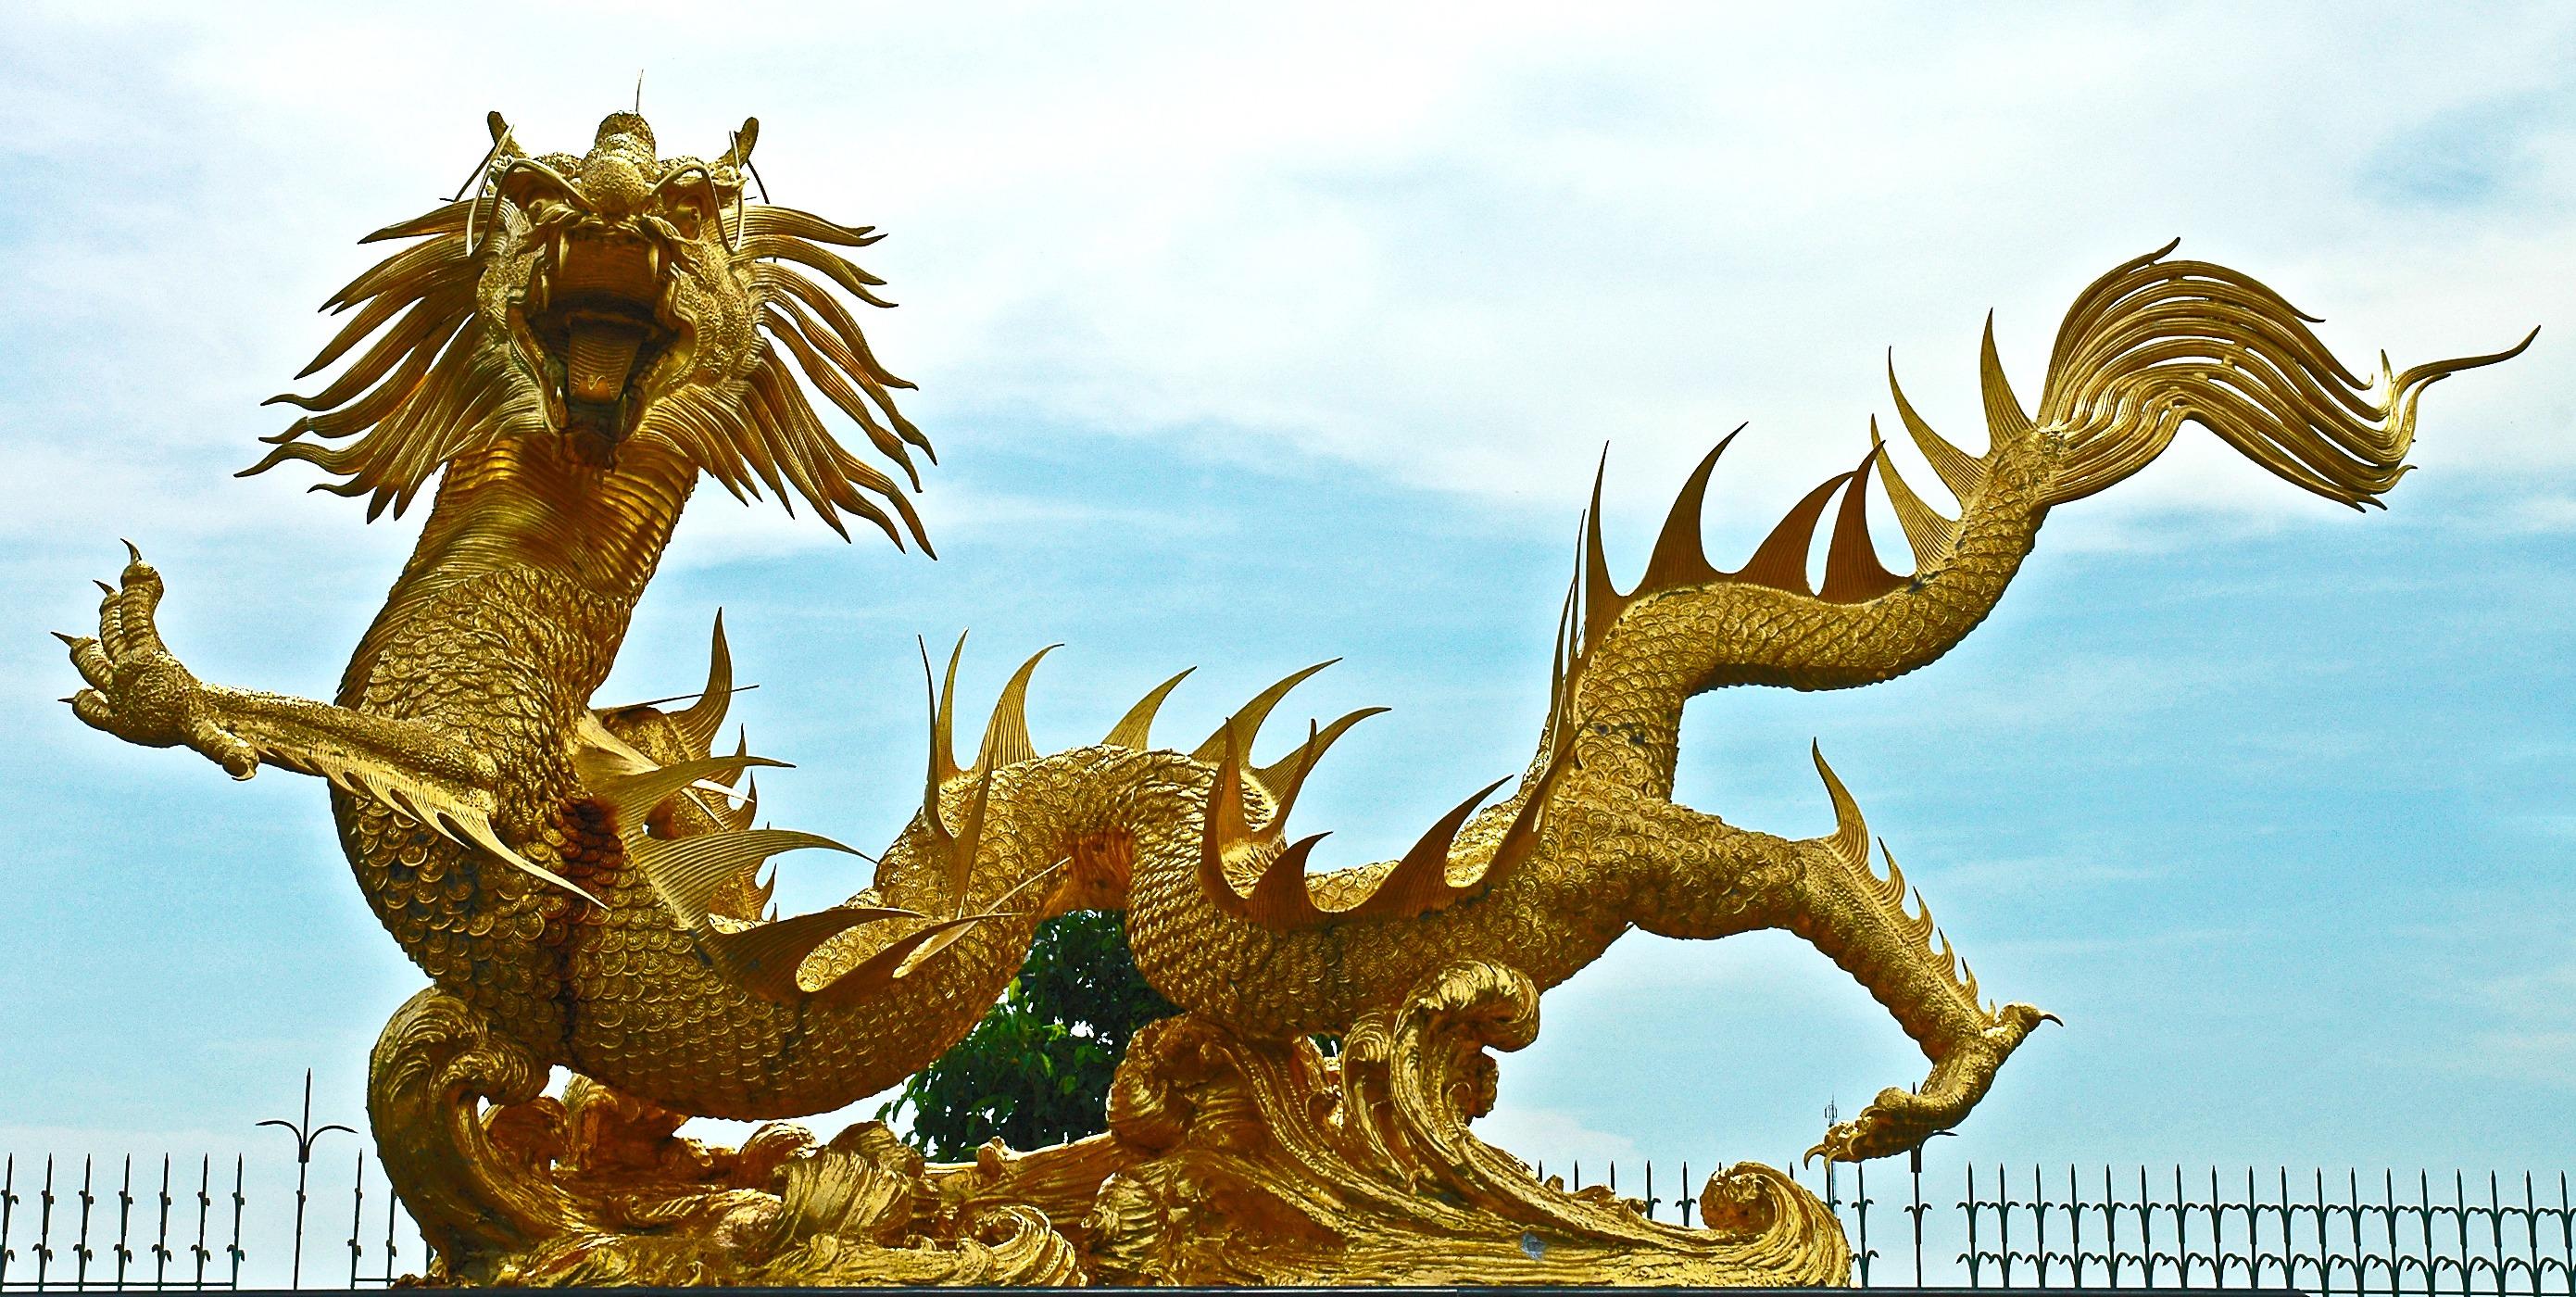 Gambar Patung Keemasan Thailand Seni Naga Mitologi 2781x1400